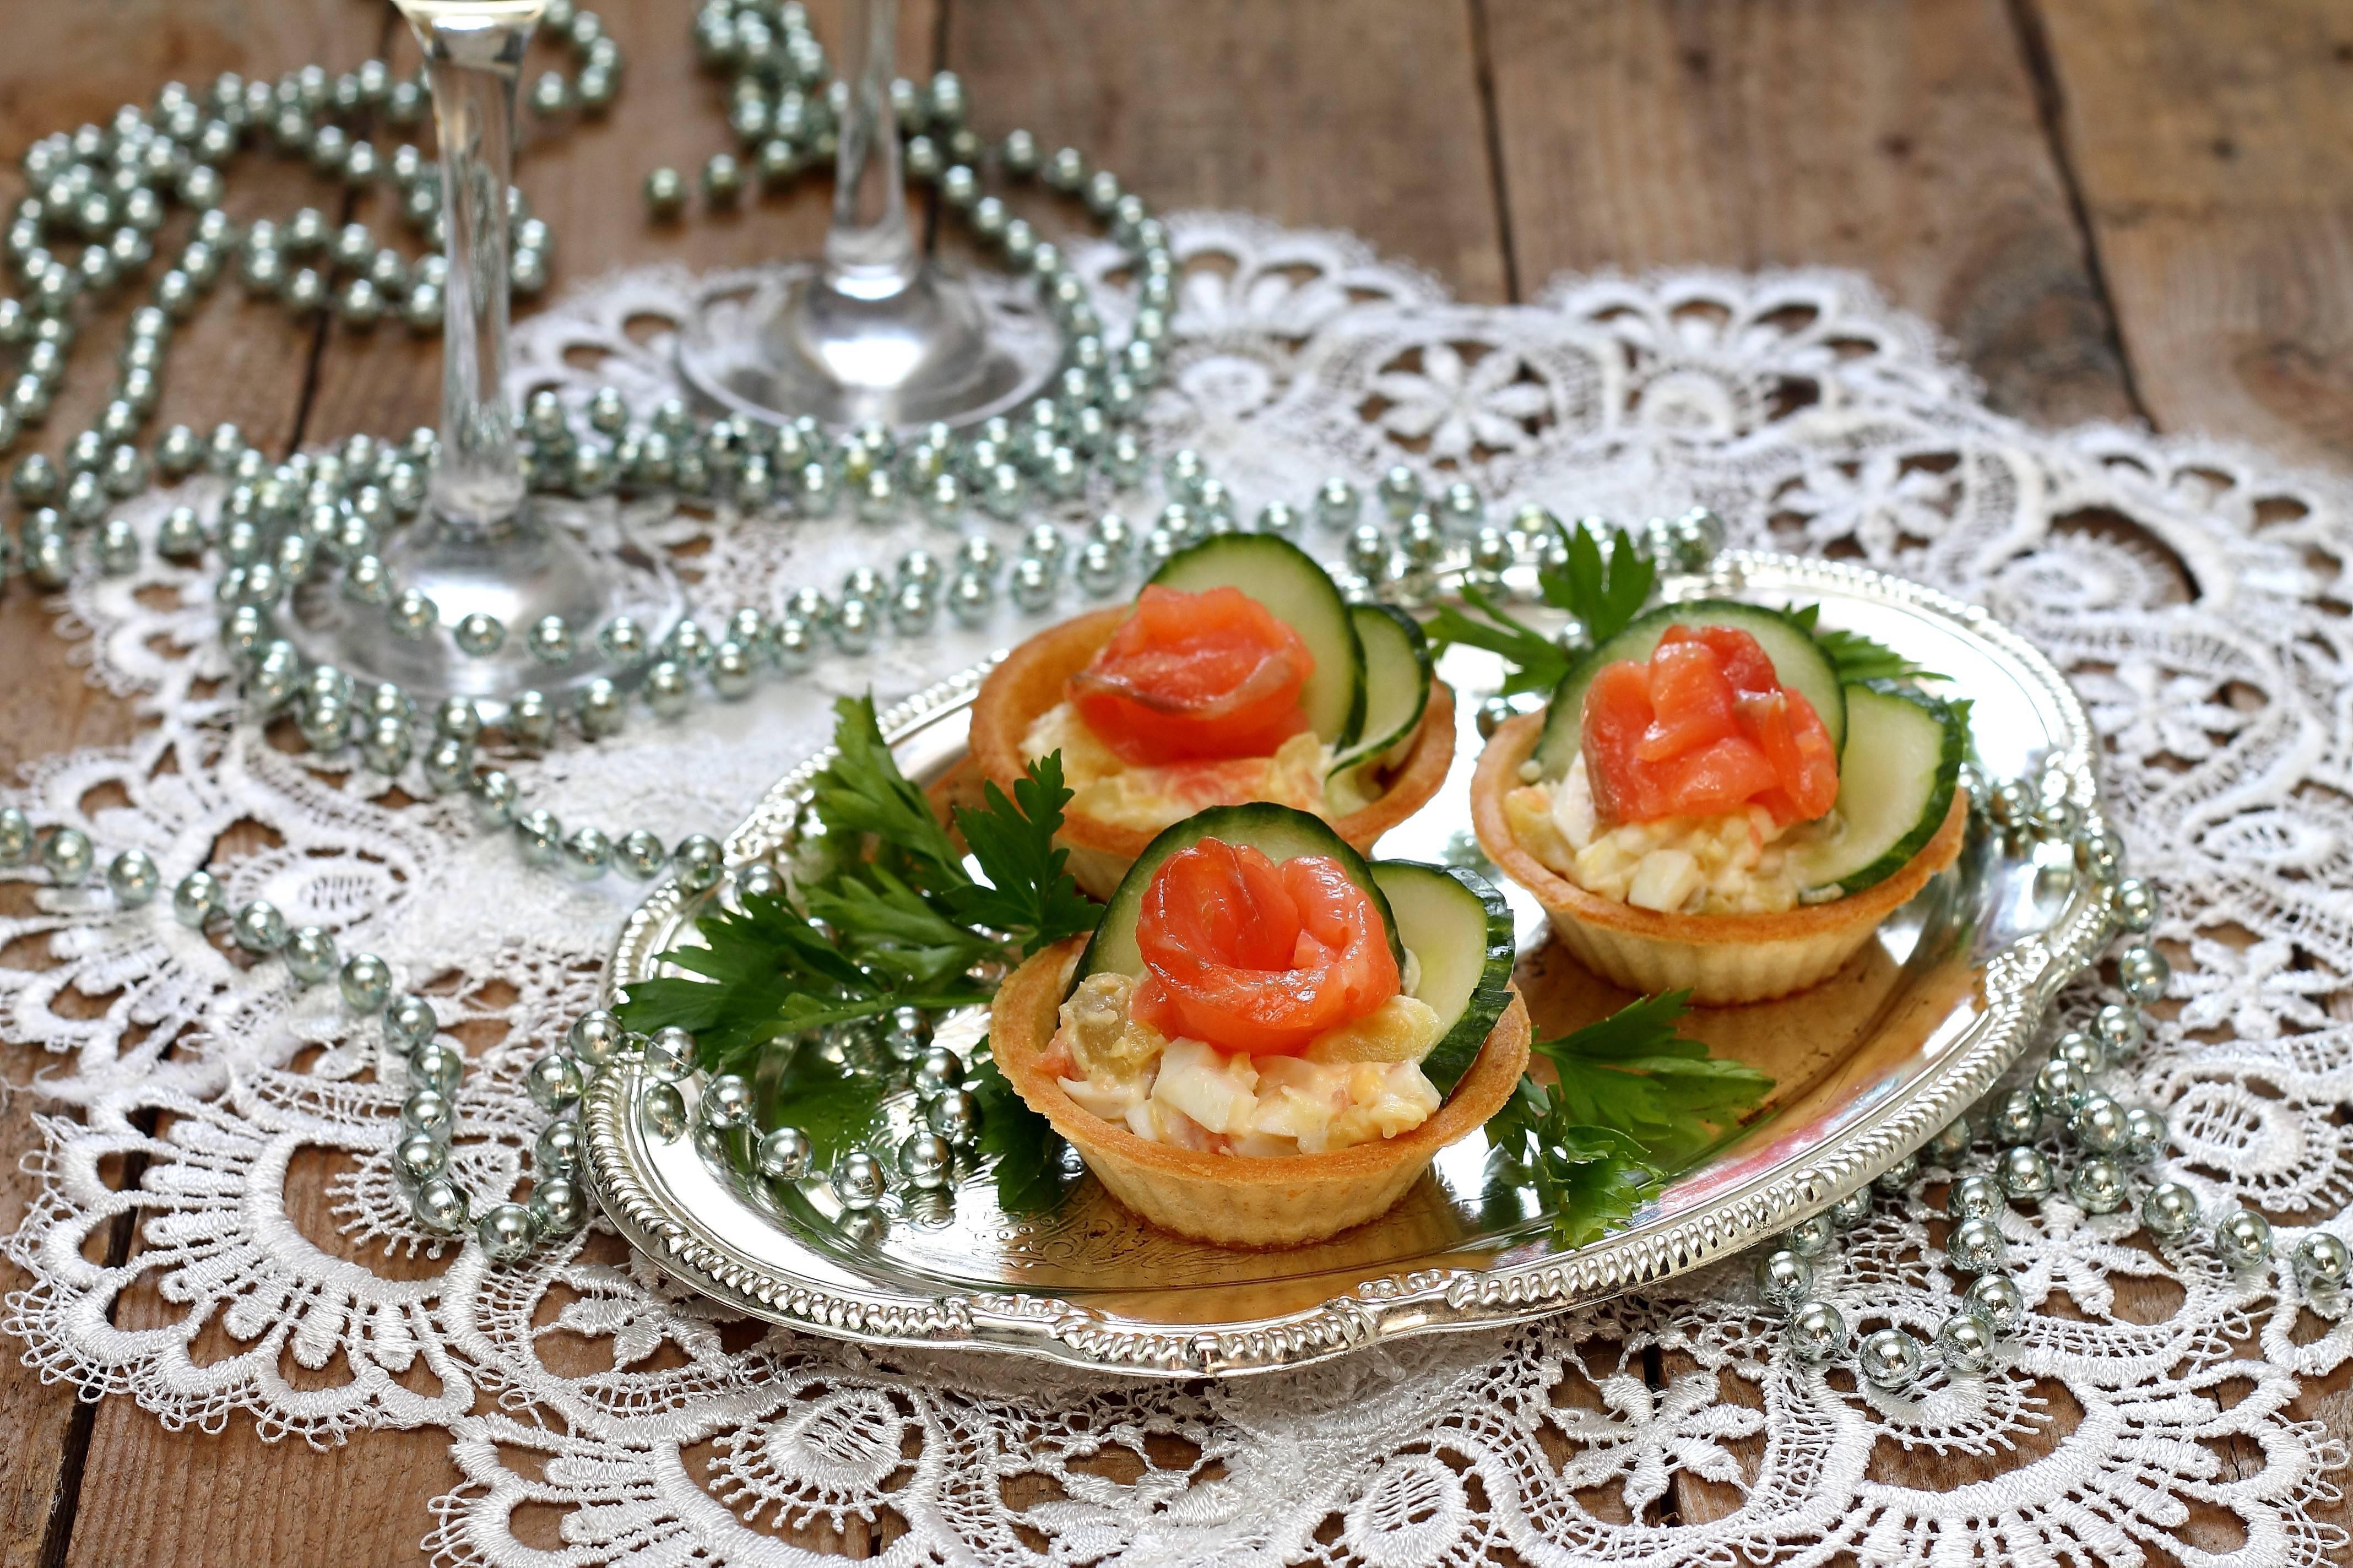 Тарталетки с начинкой - 50 рецептов с фото